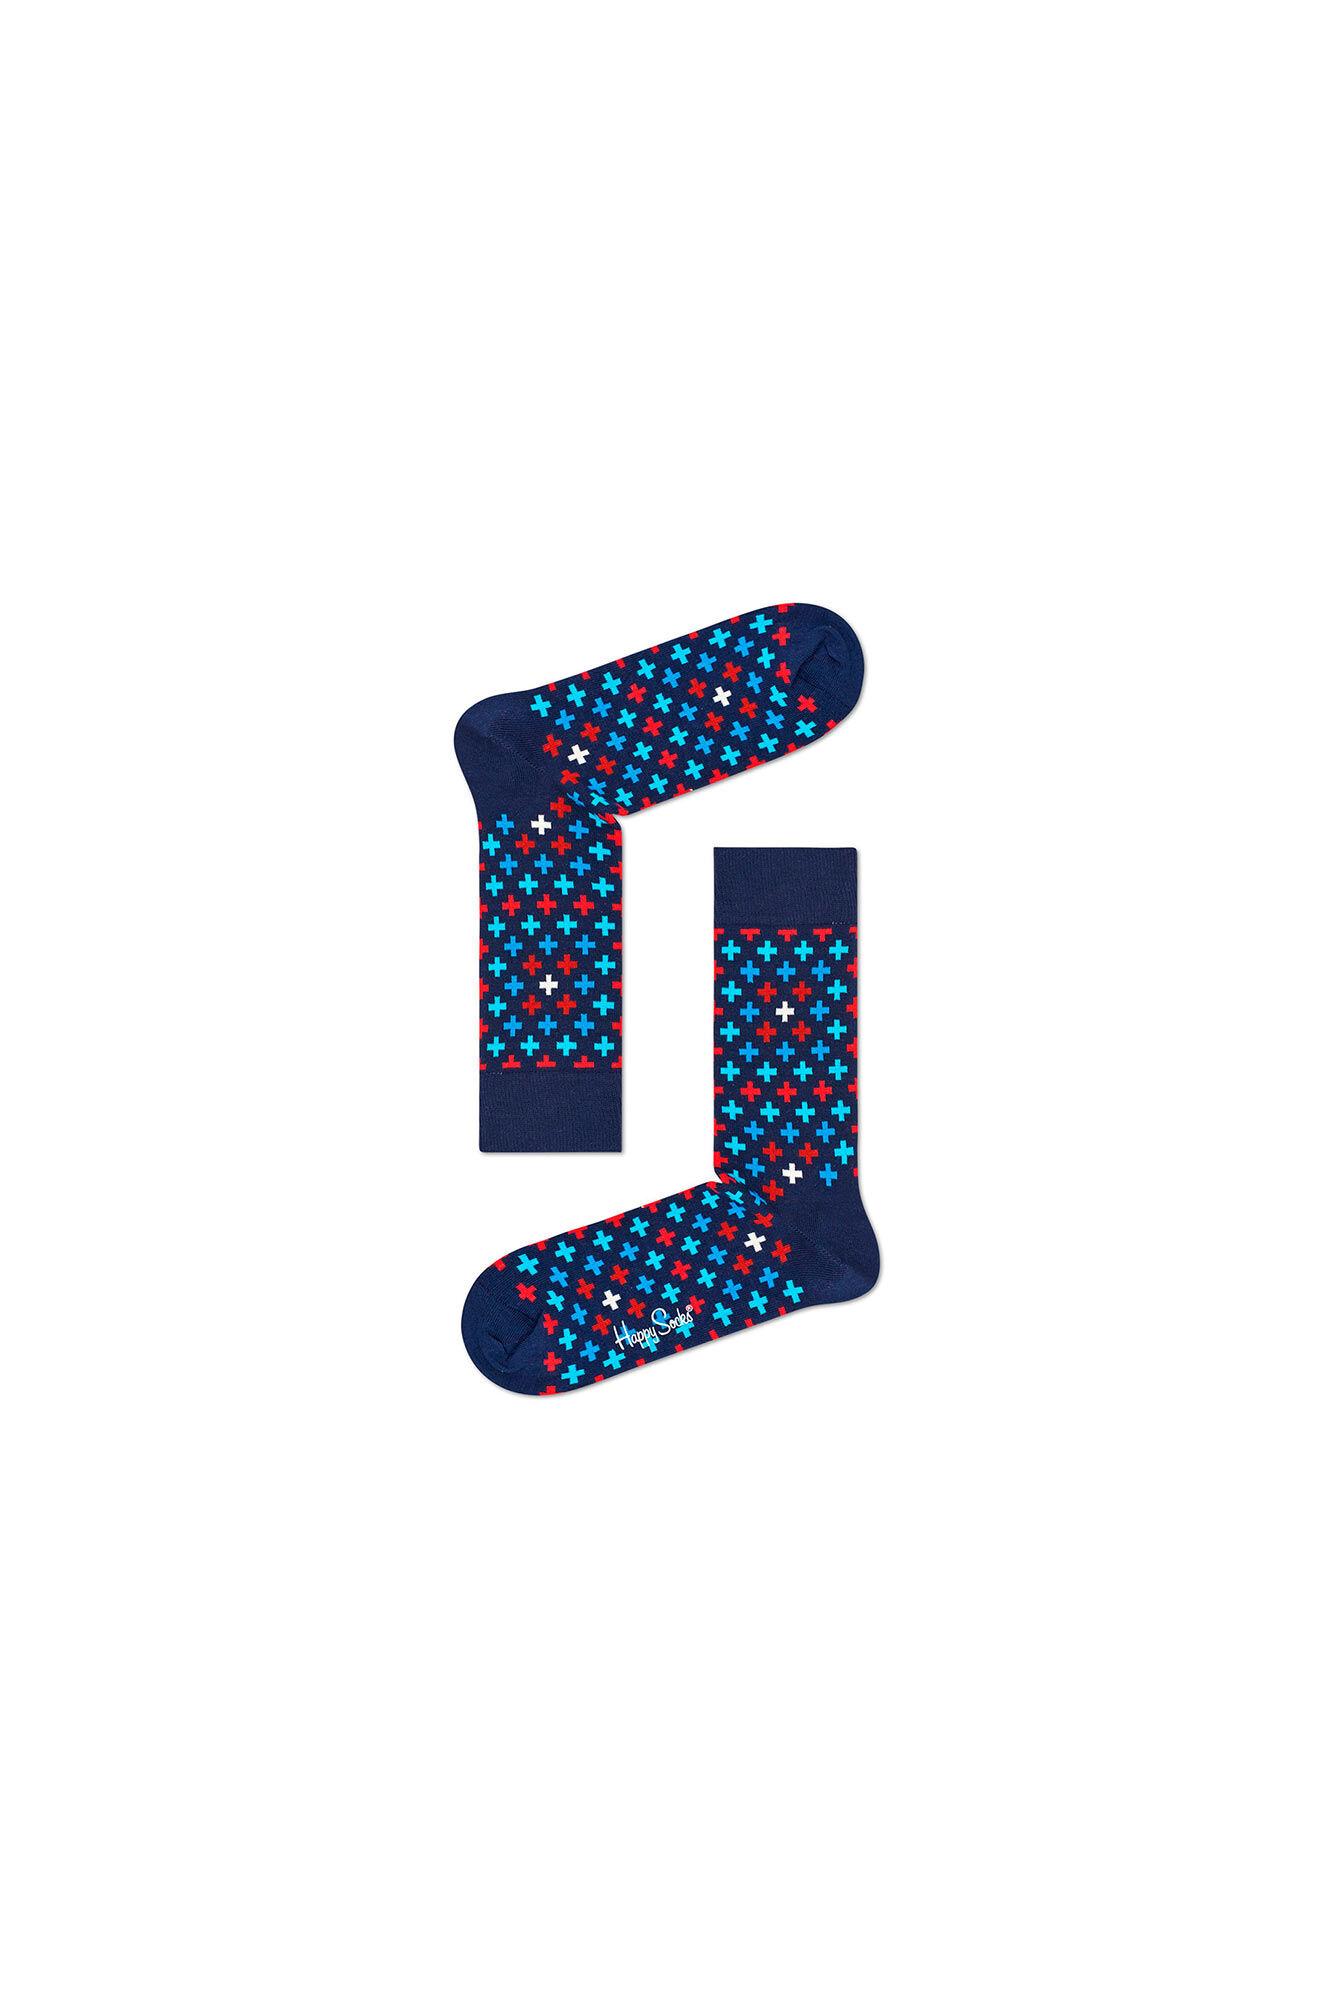 Plus Sock PLU01, 6000